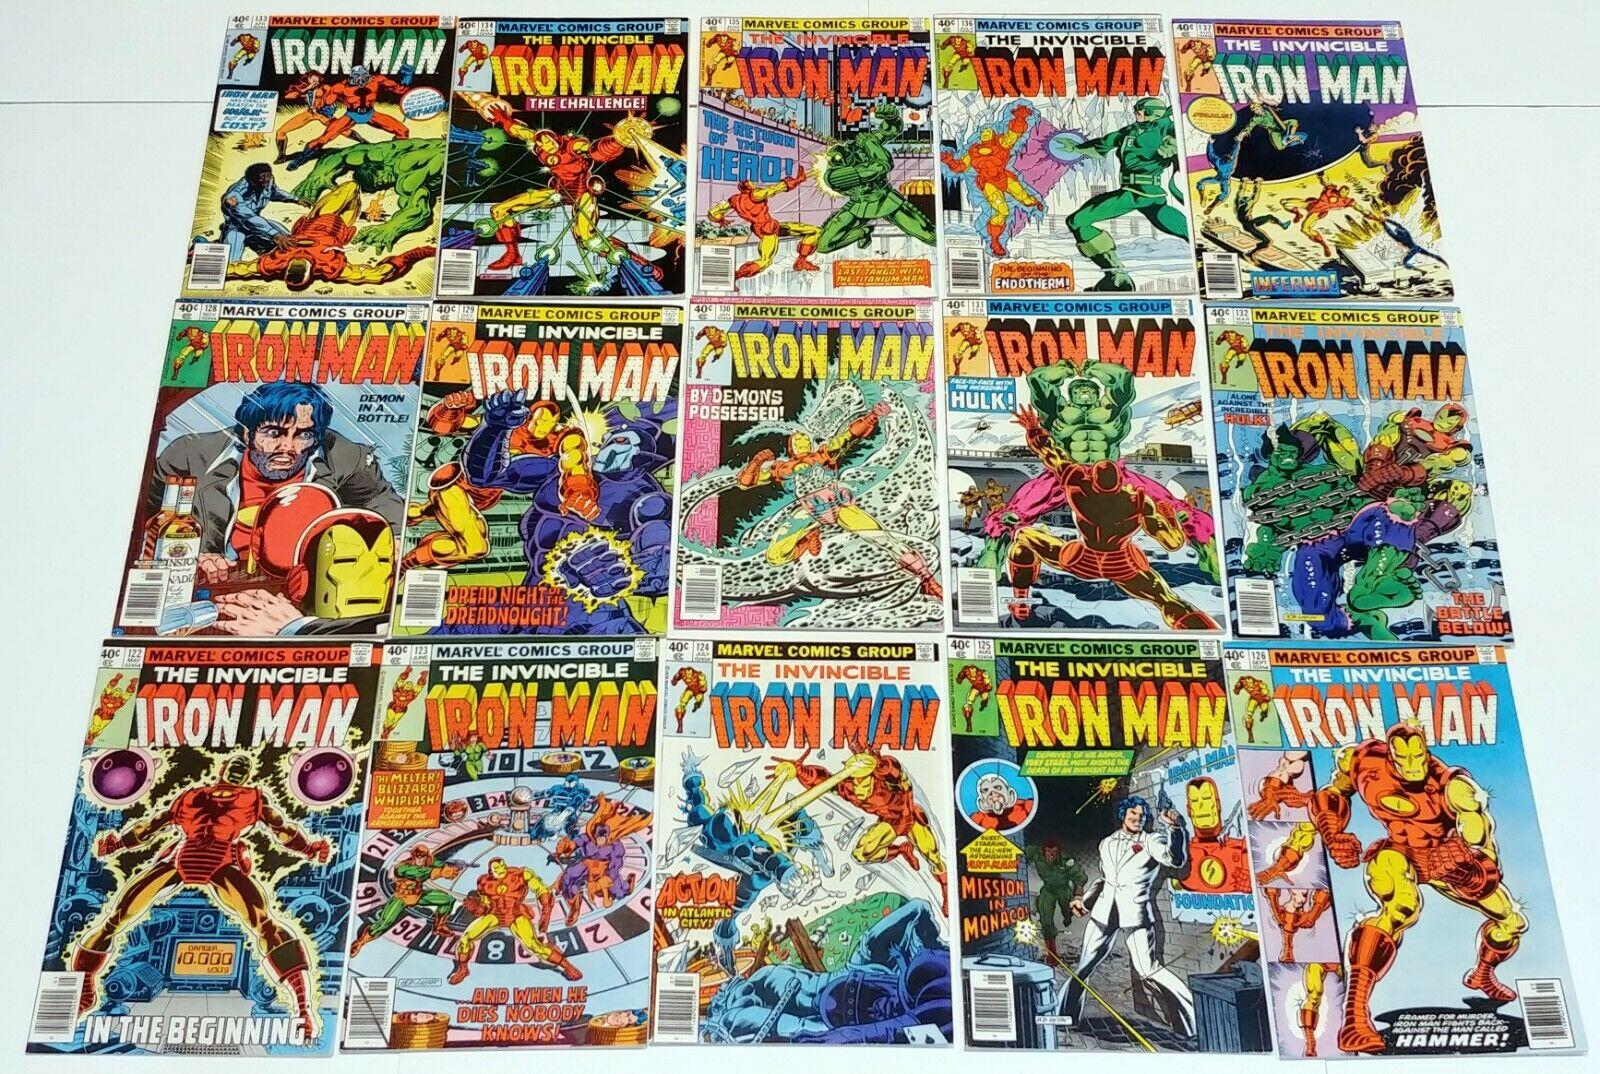 IRON MAN #122-126 #128 KEY 129 to 137 Marvel Bronze Age Comic 15pc Run Lot